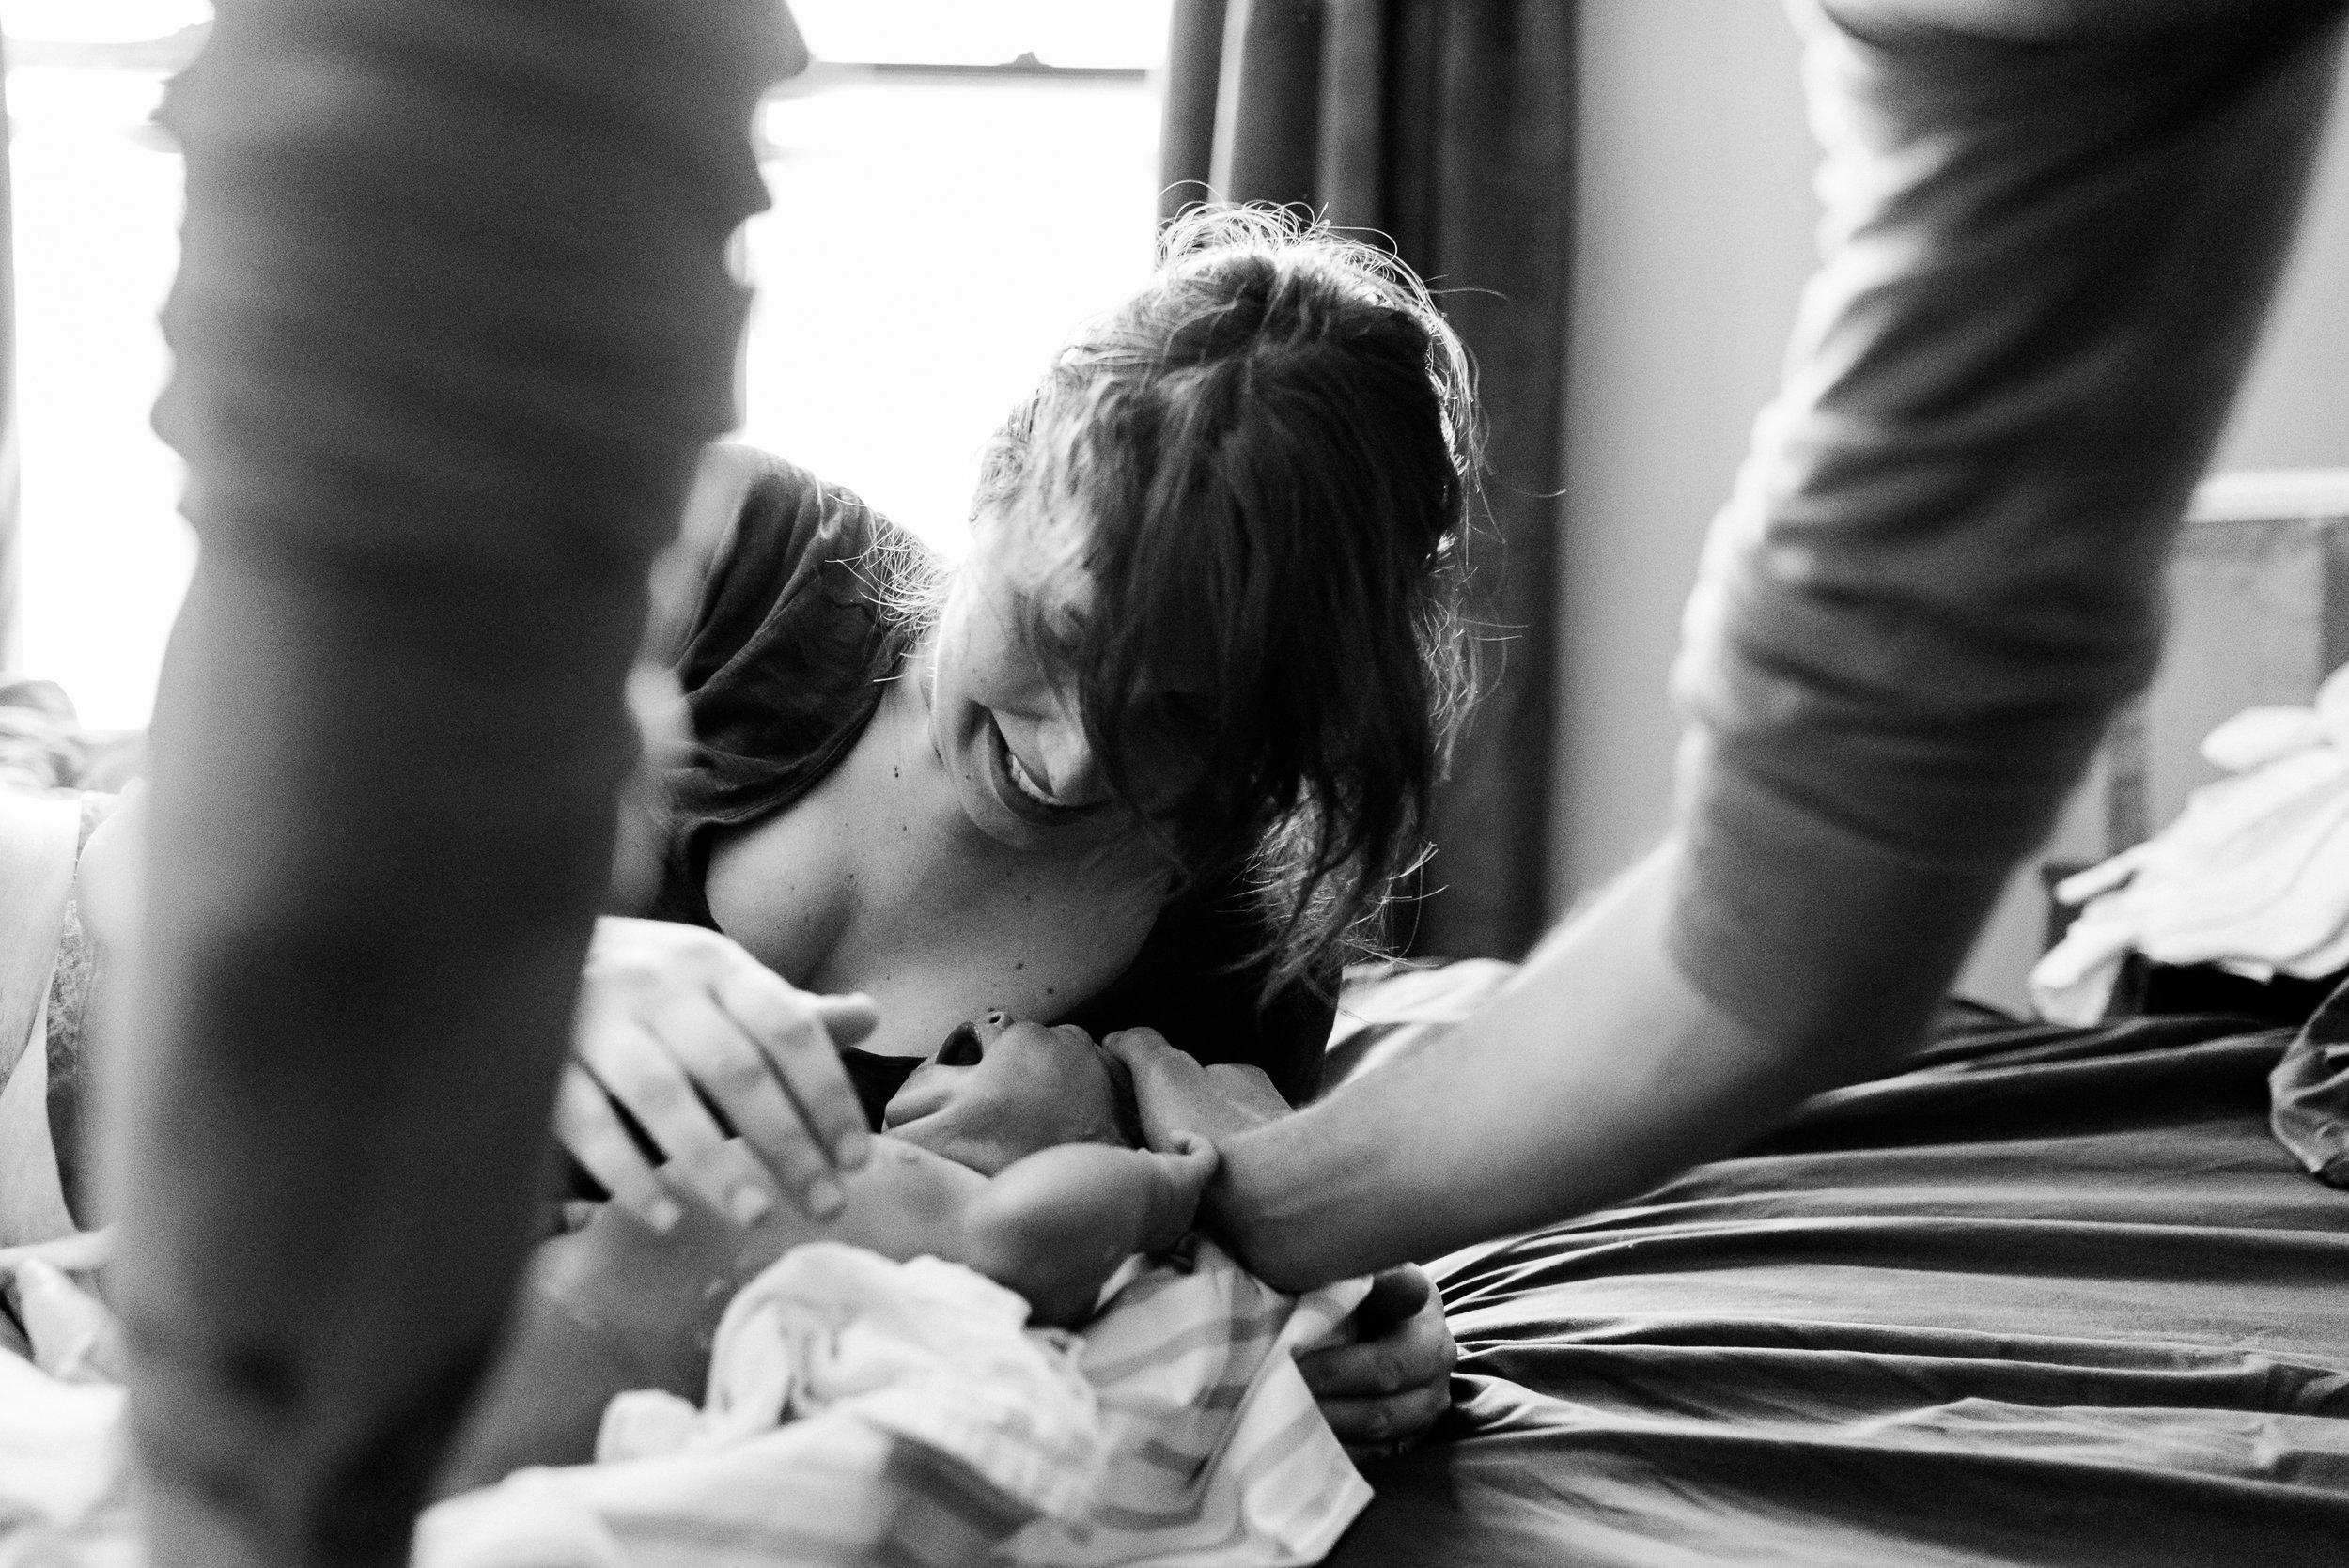 ruiter-birth-12.11.16-70.jpg